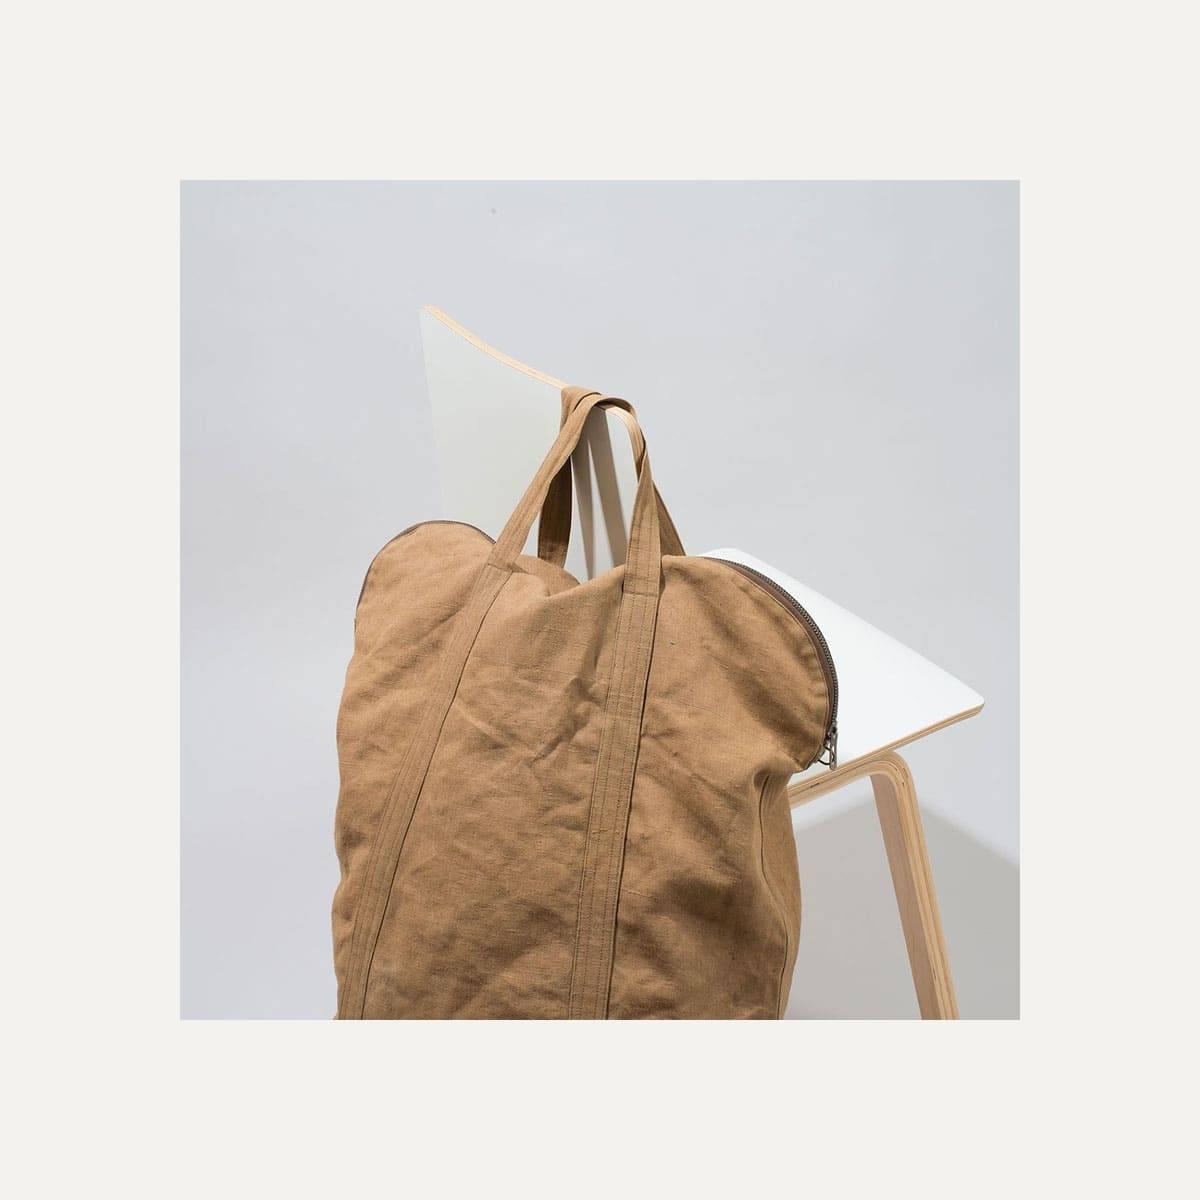 N°4: 'Cashew-colored' linen parachute bag (image n°7)